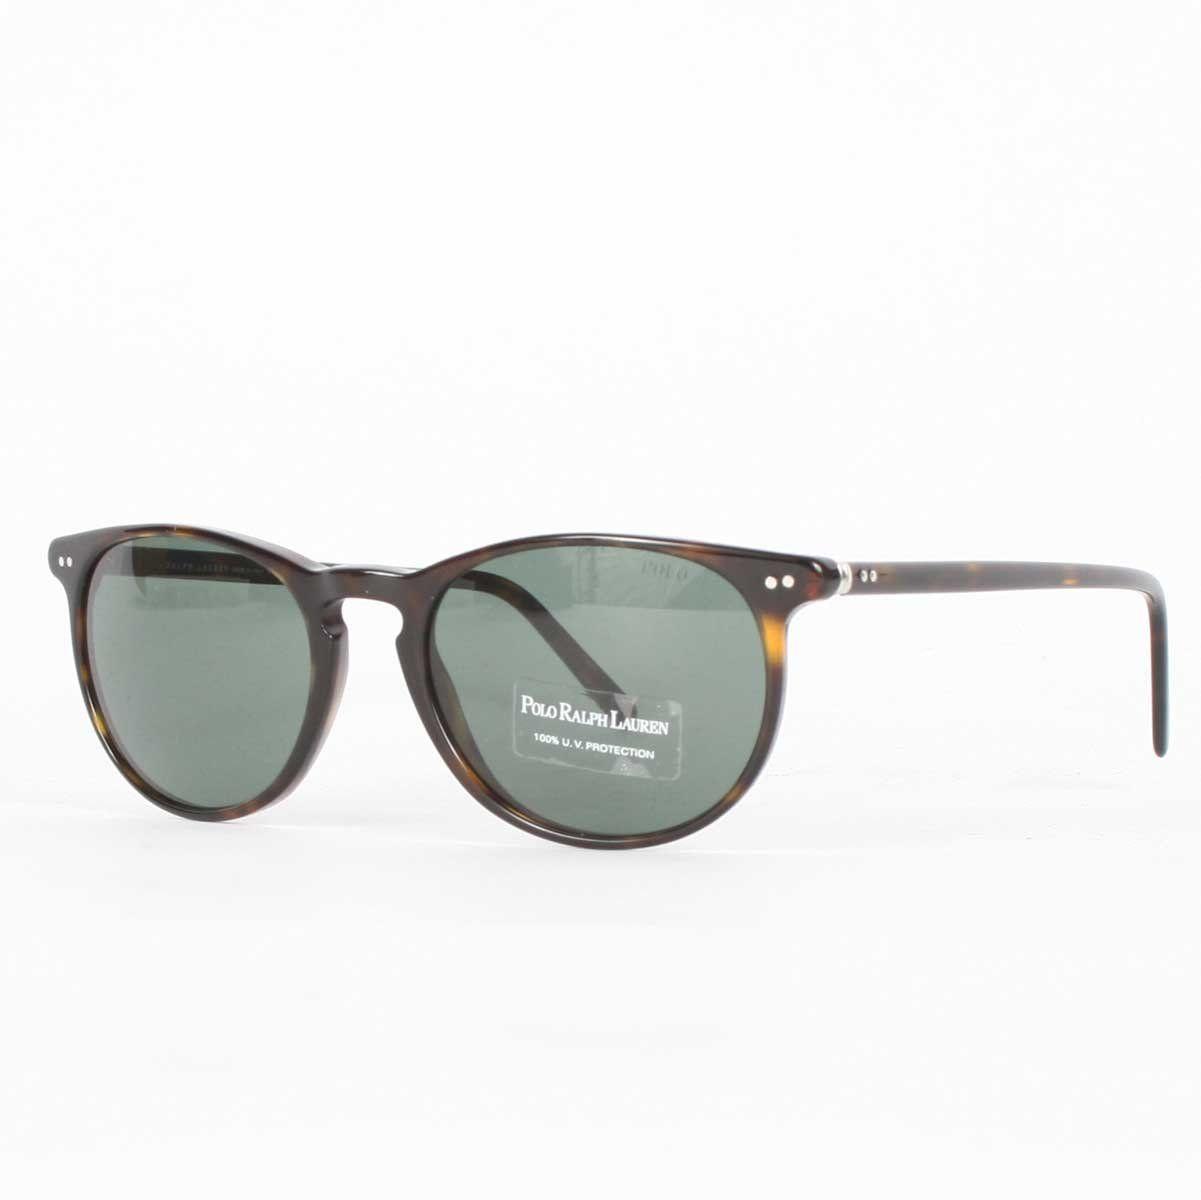 b5cd32001a54 Polo Ralph Lauren PH 4044 Sunglasses 500371 Havana Brown | Clothes I ...